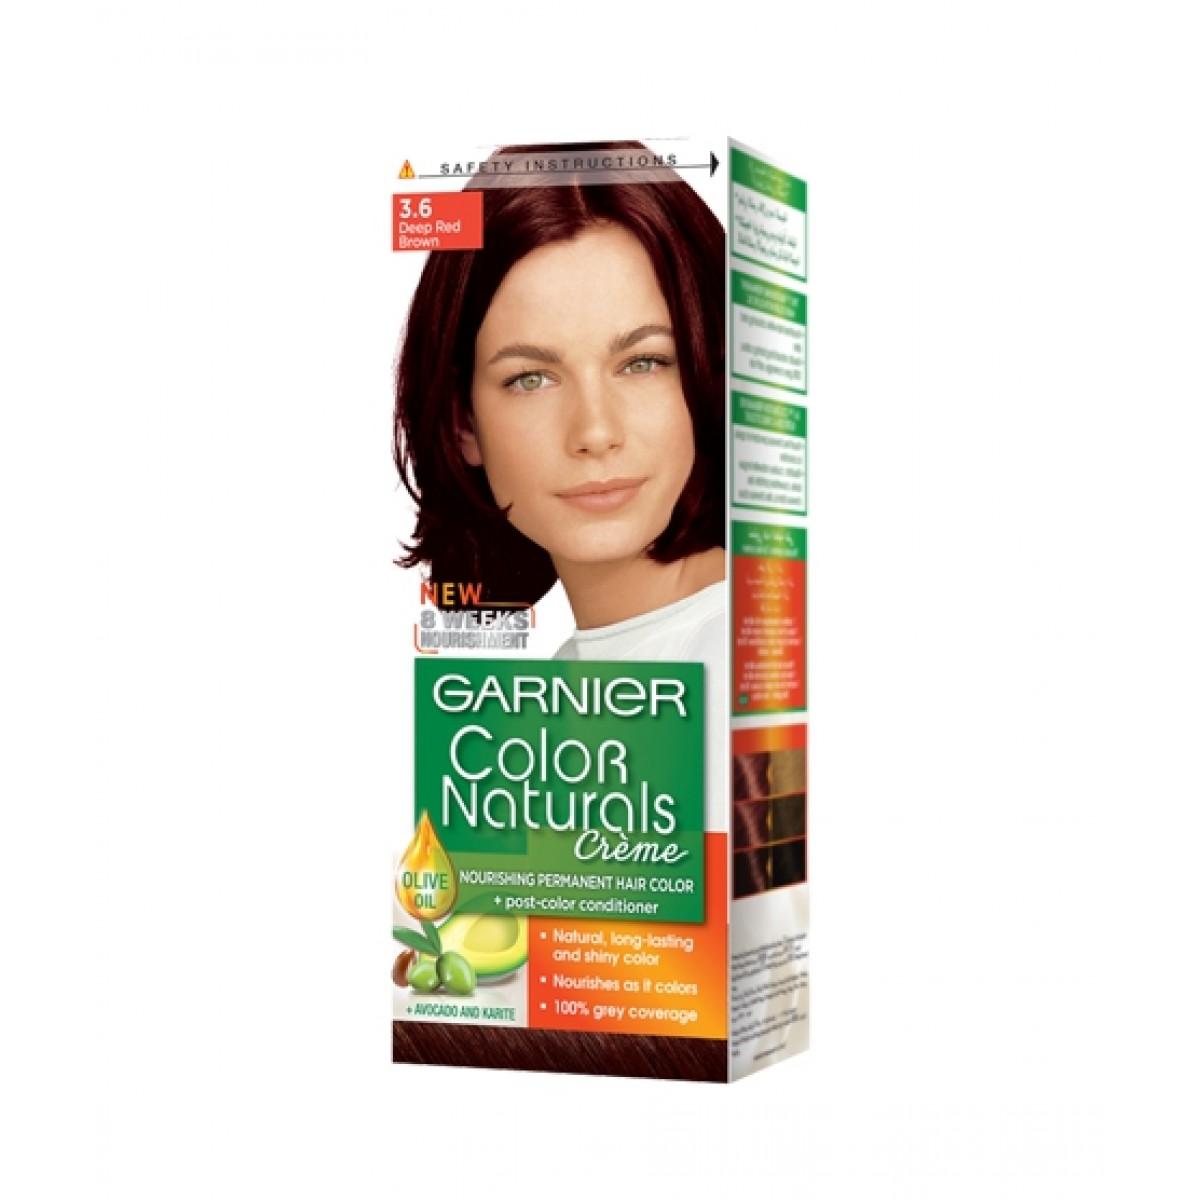 Garnier Color Naturals 3.6 Hair Color Deep Red Brown